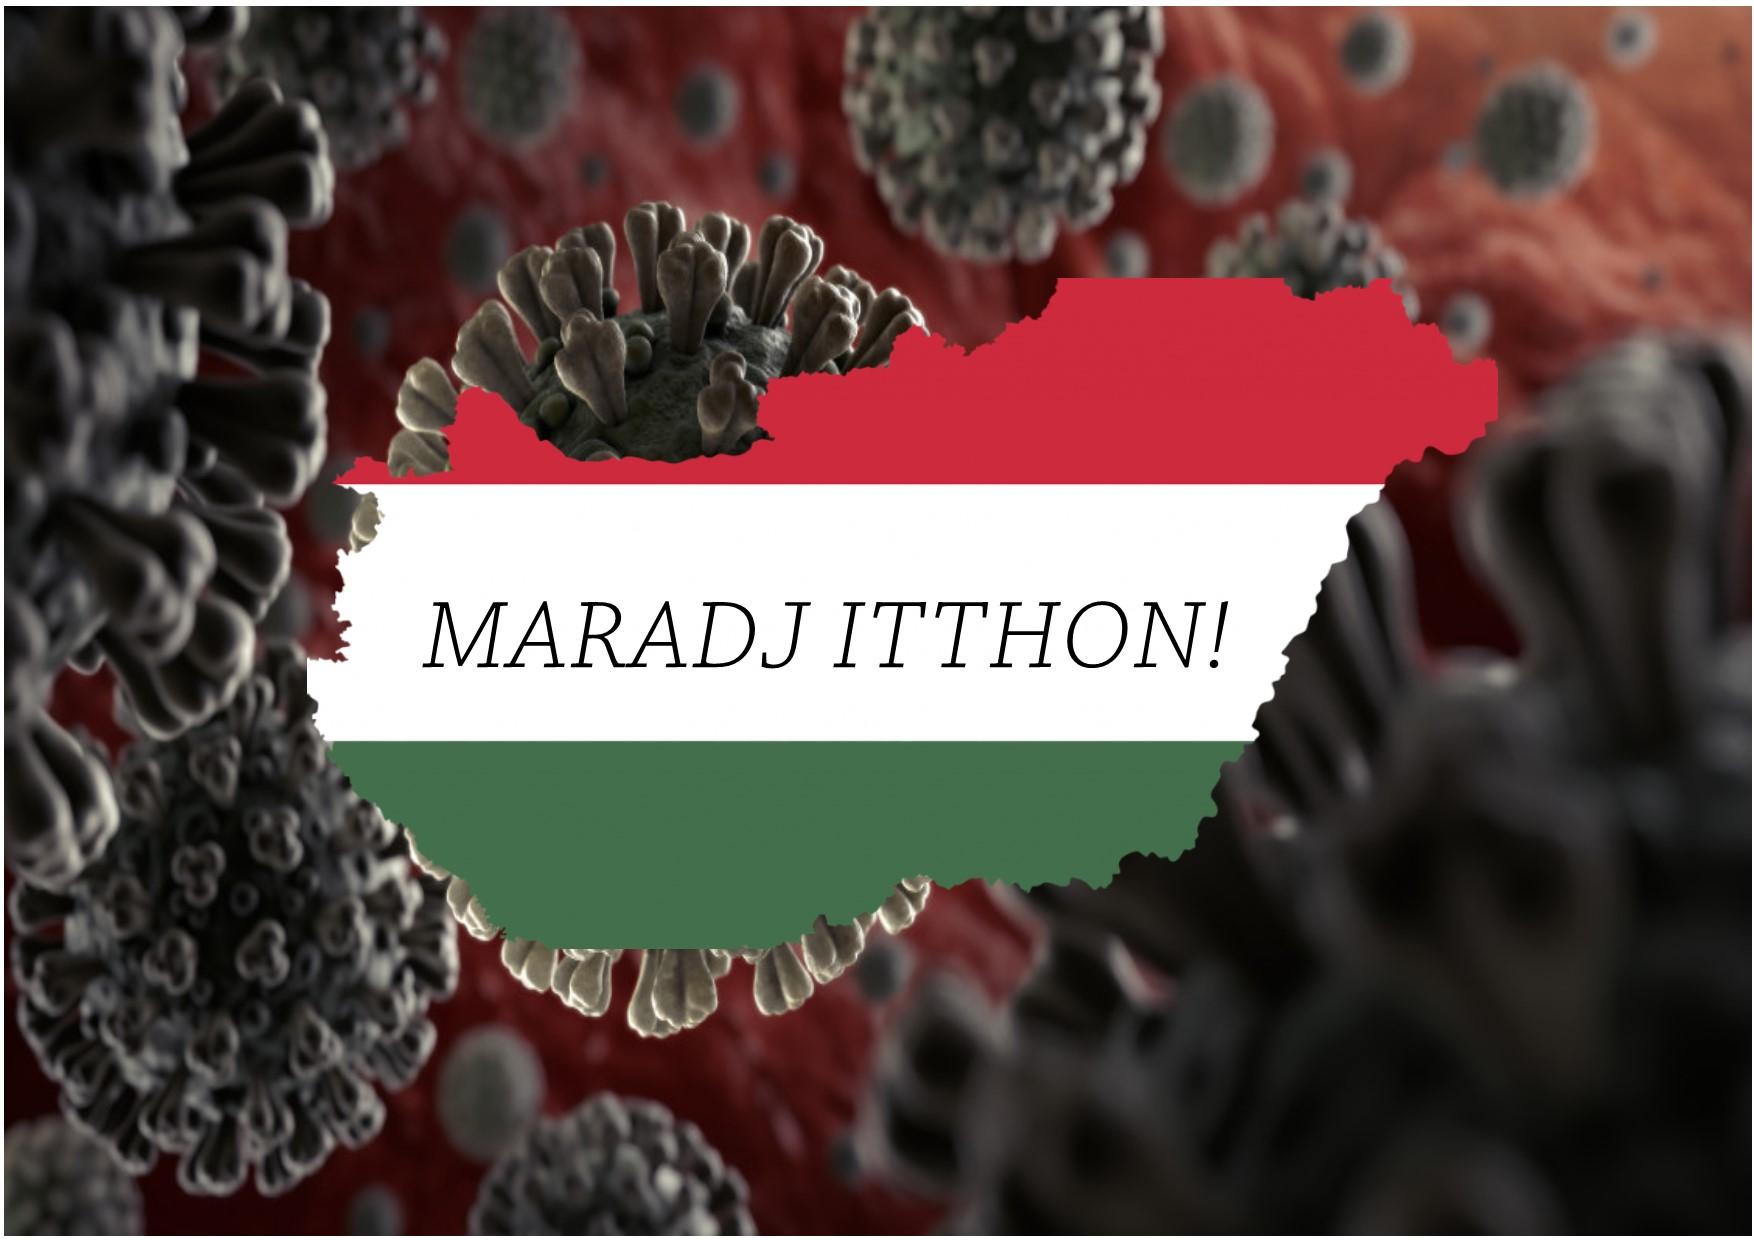 maraditthon.jpg